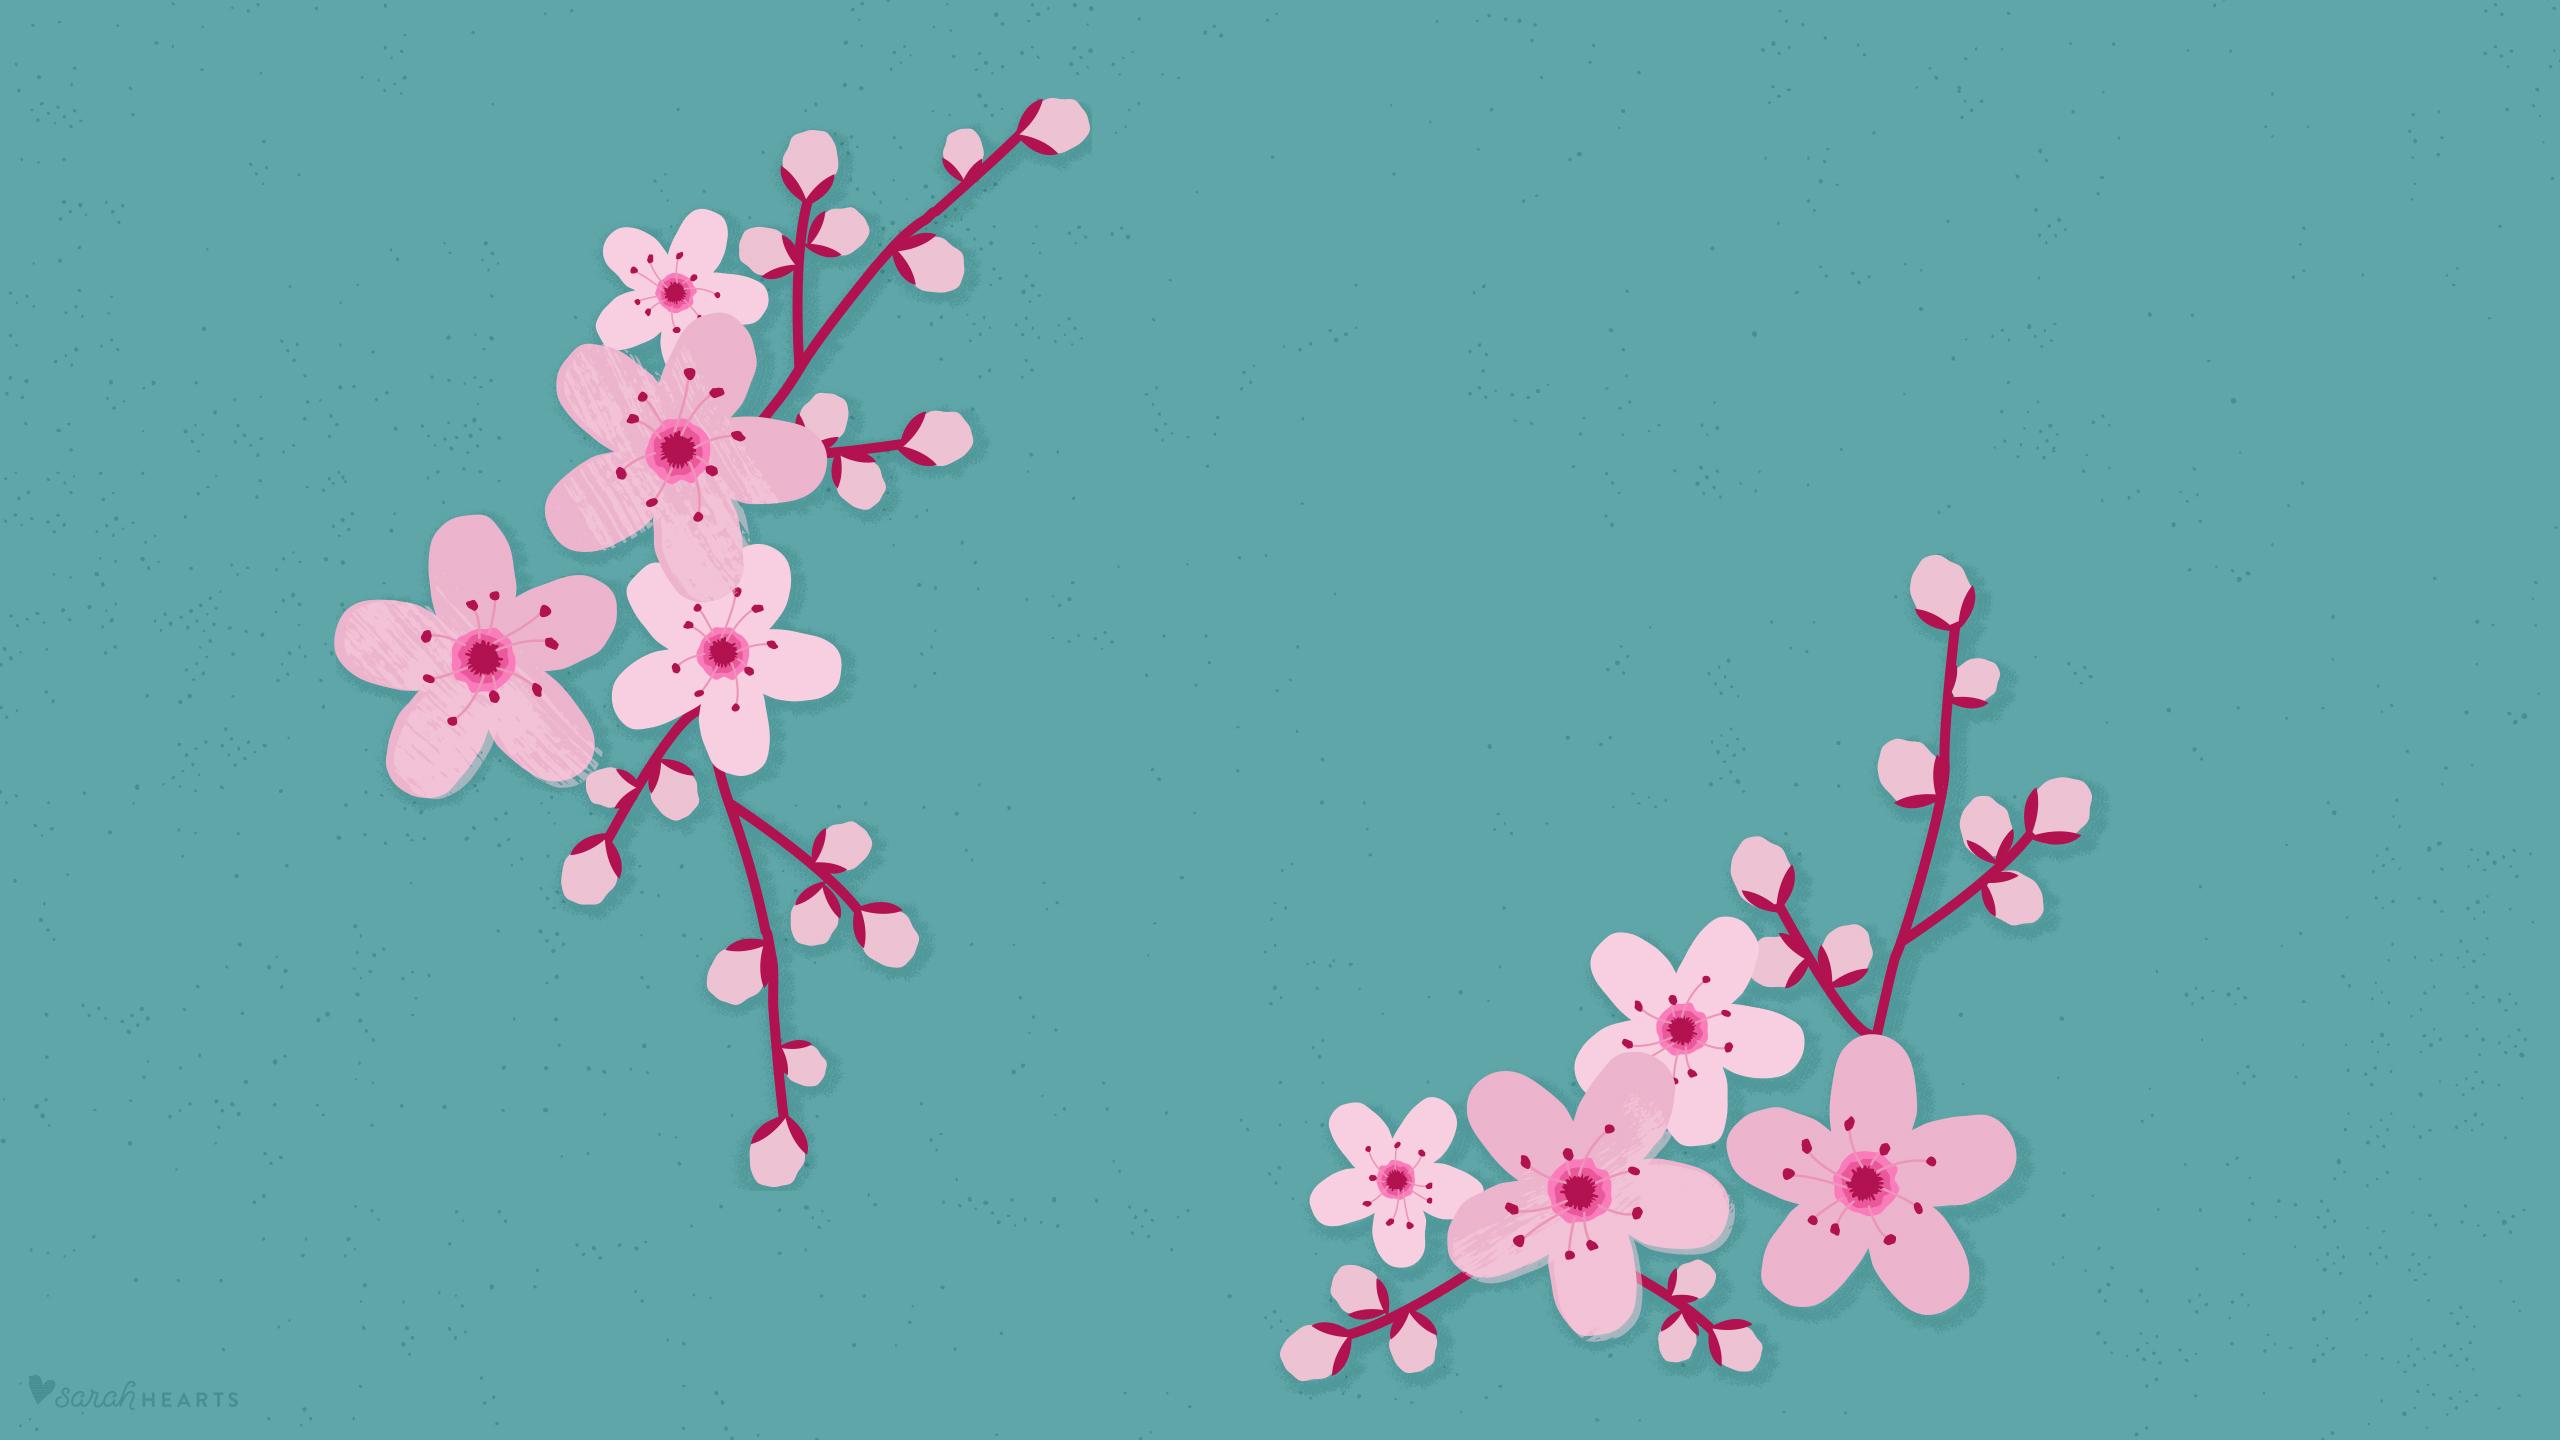 March 2016 Cherry Blossom Calendar Wallpaper